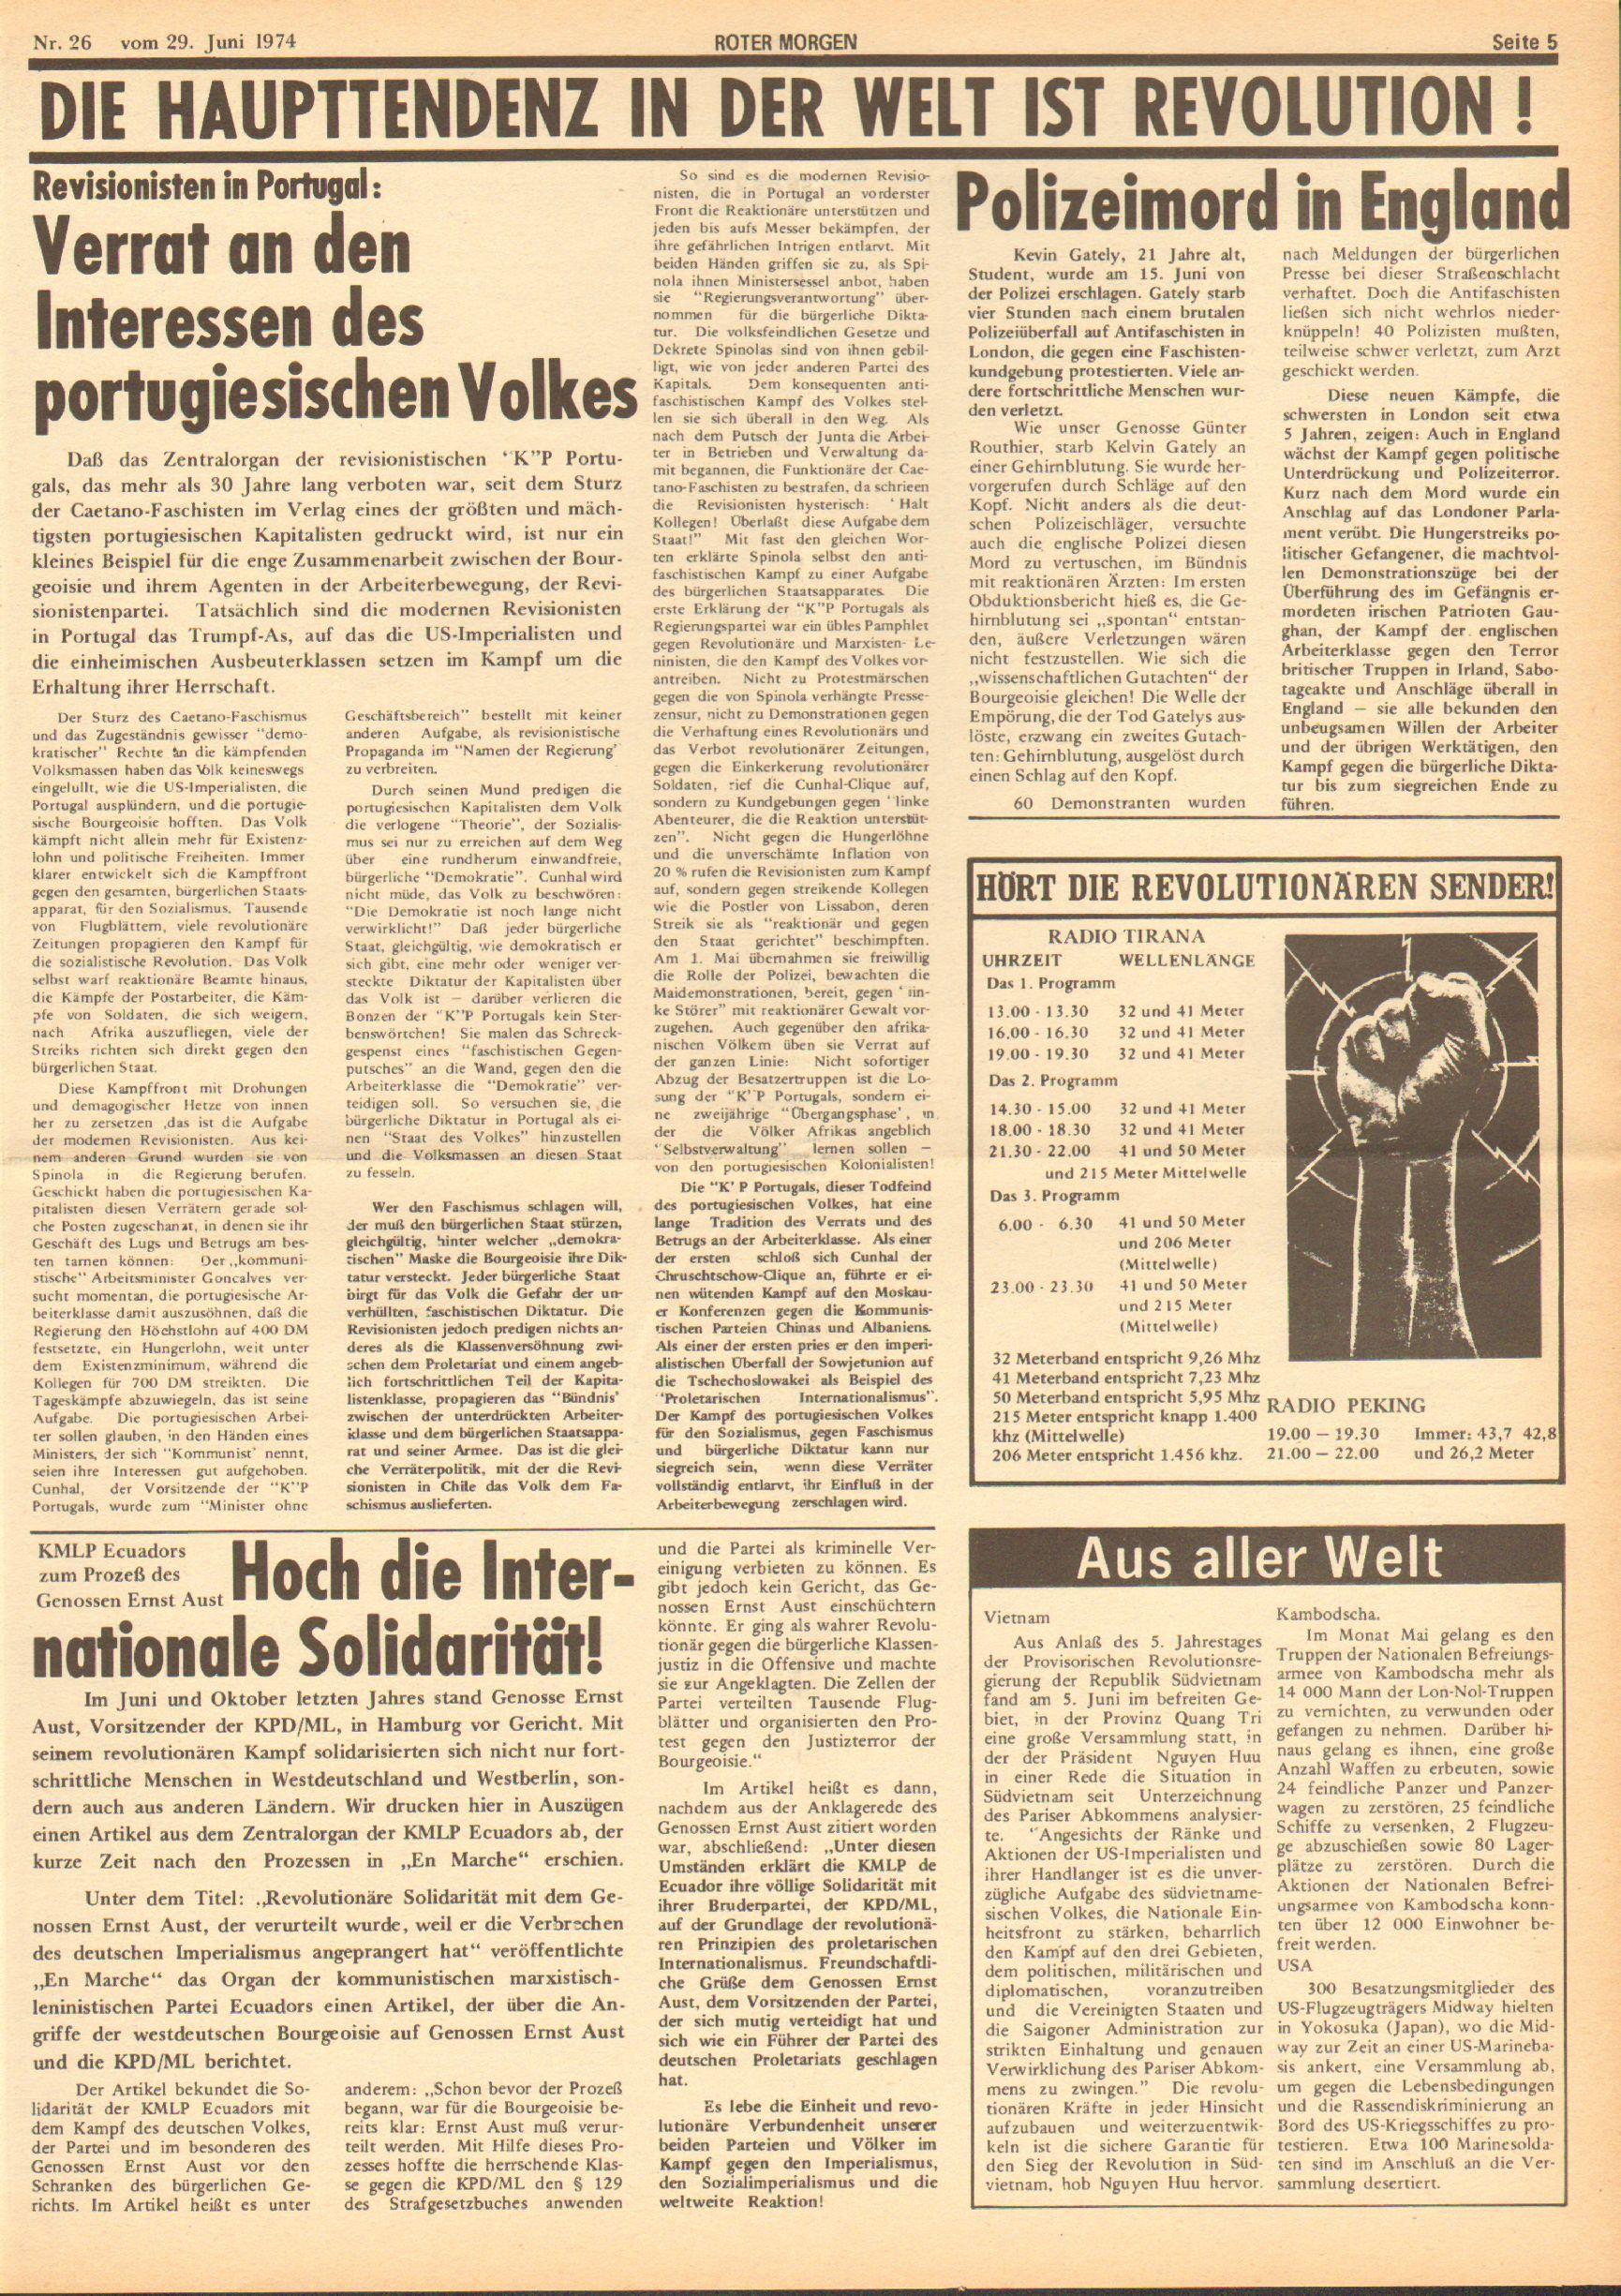 Roter Morgen, 8. Jg., 29. Juni 1974, Nr. 26, Seite 5